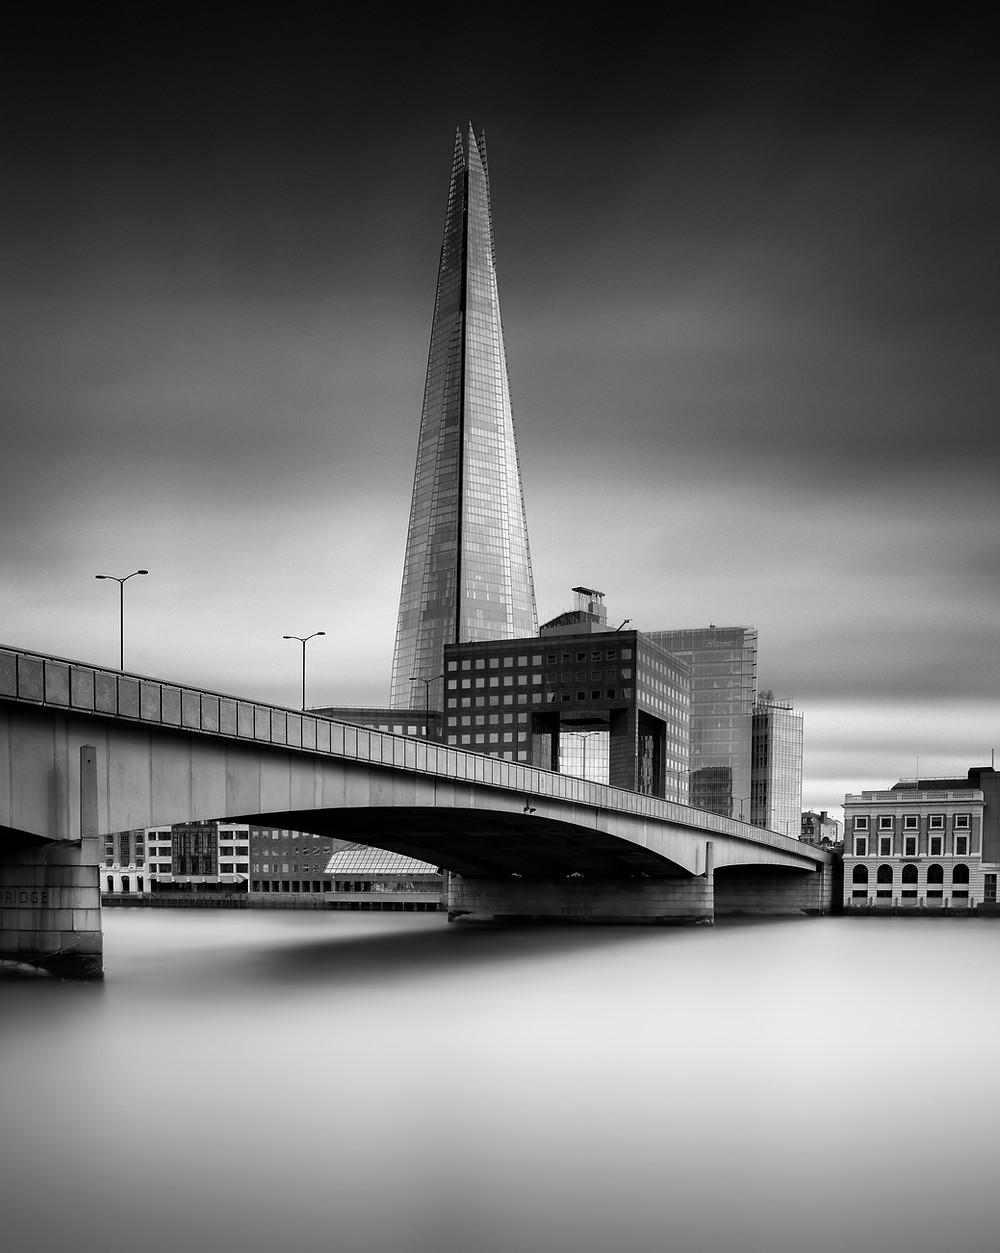 The Shard London Bridge, Long Exposure